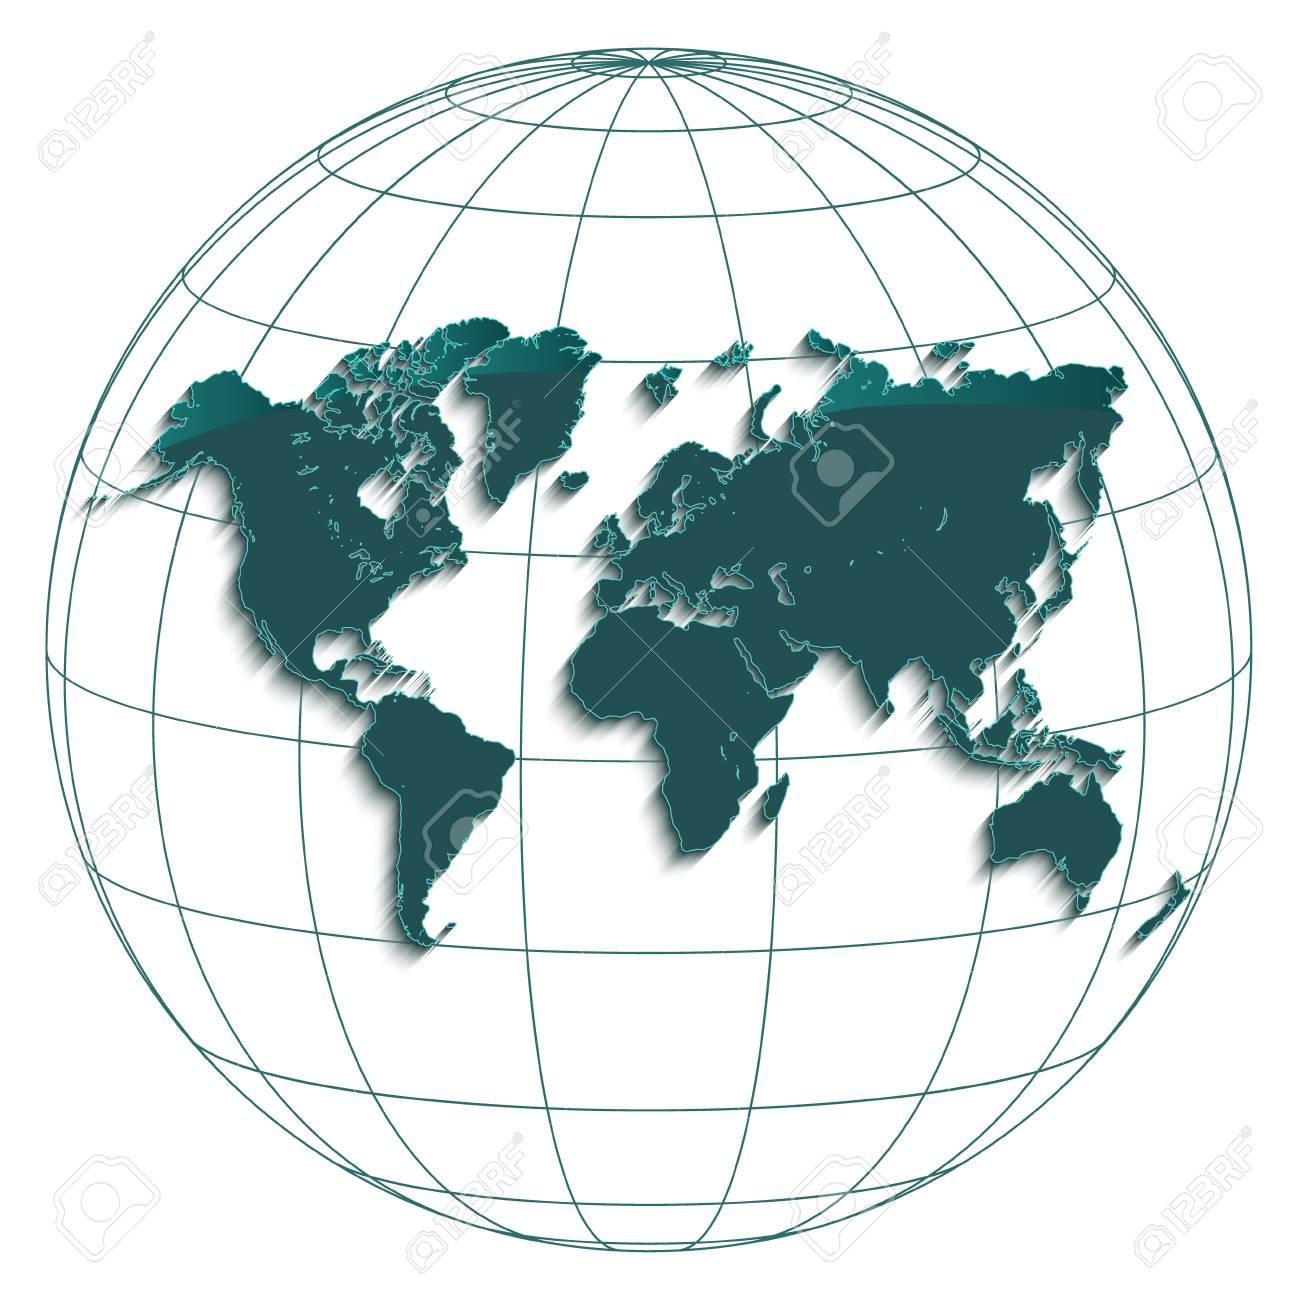 World map globe earth globe geographic coordinates white background..